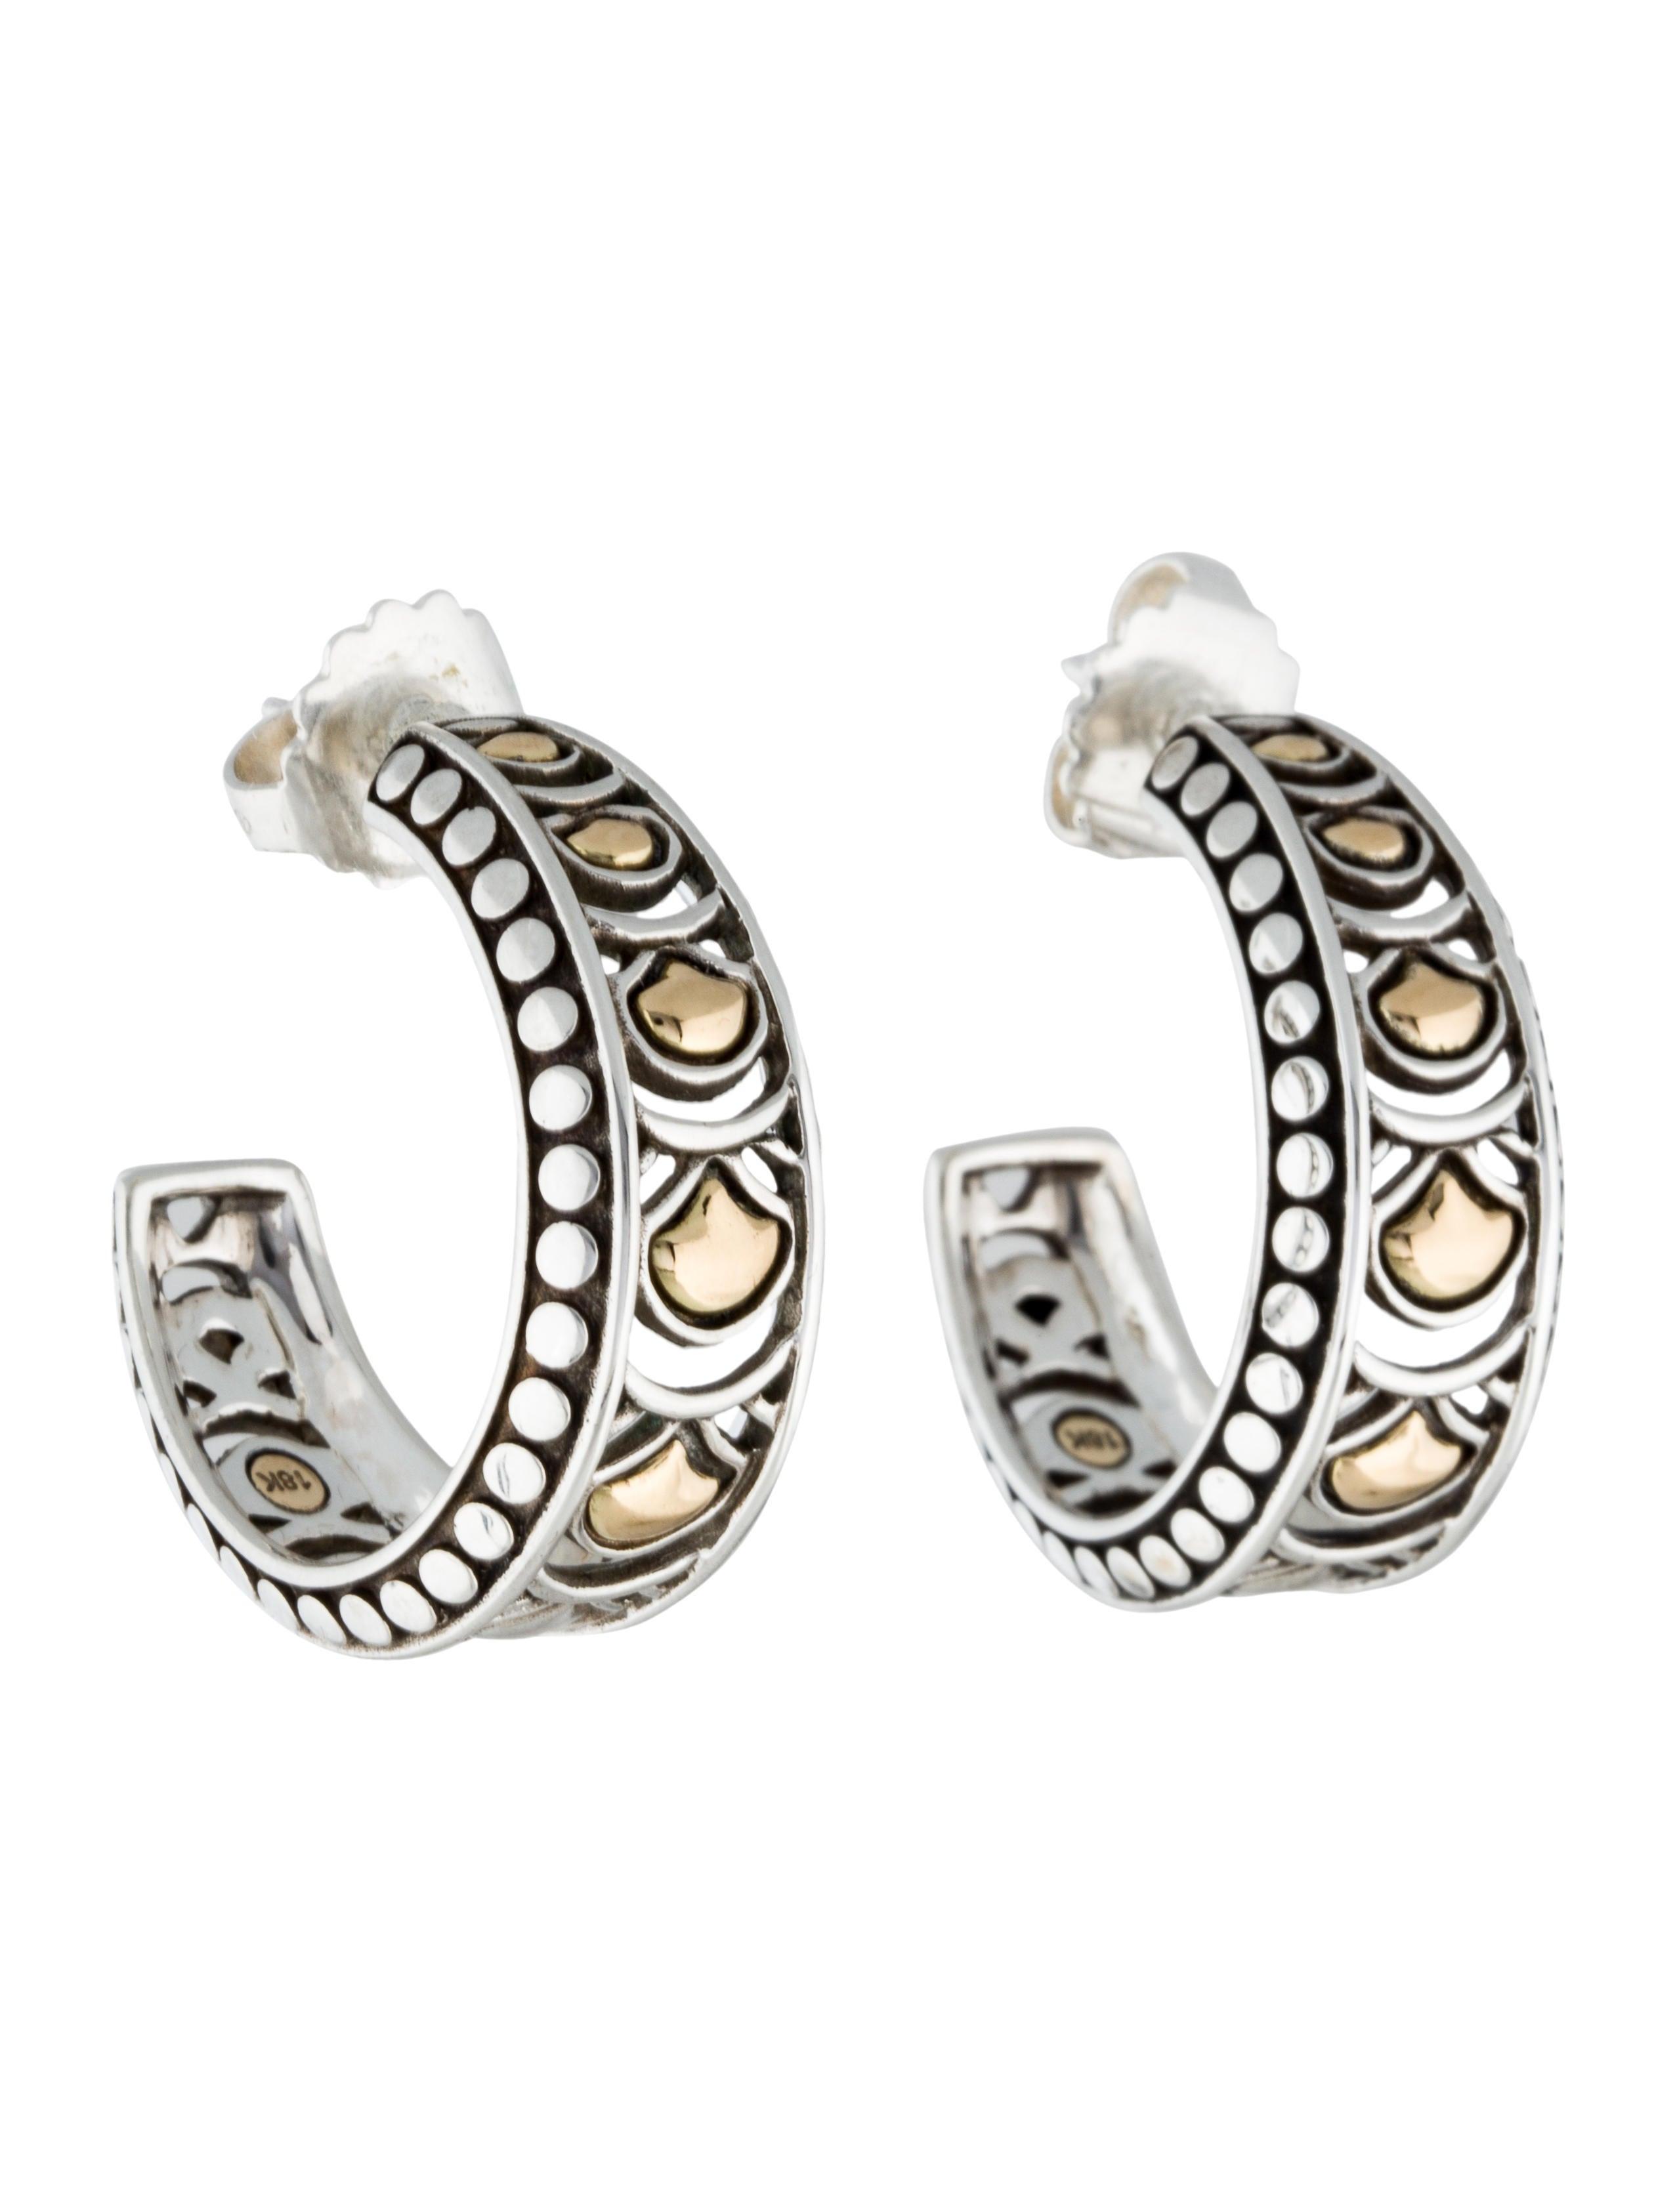 563a52d565642 Two-Tone Legends Naga Small Hoop Earrings